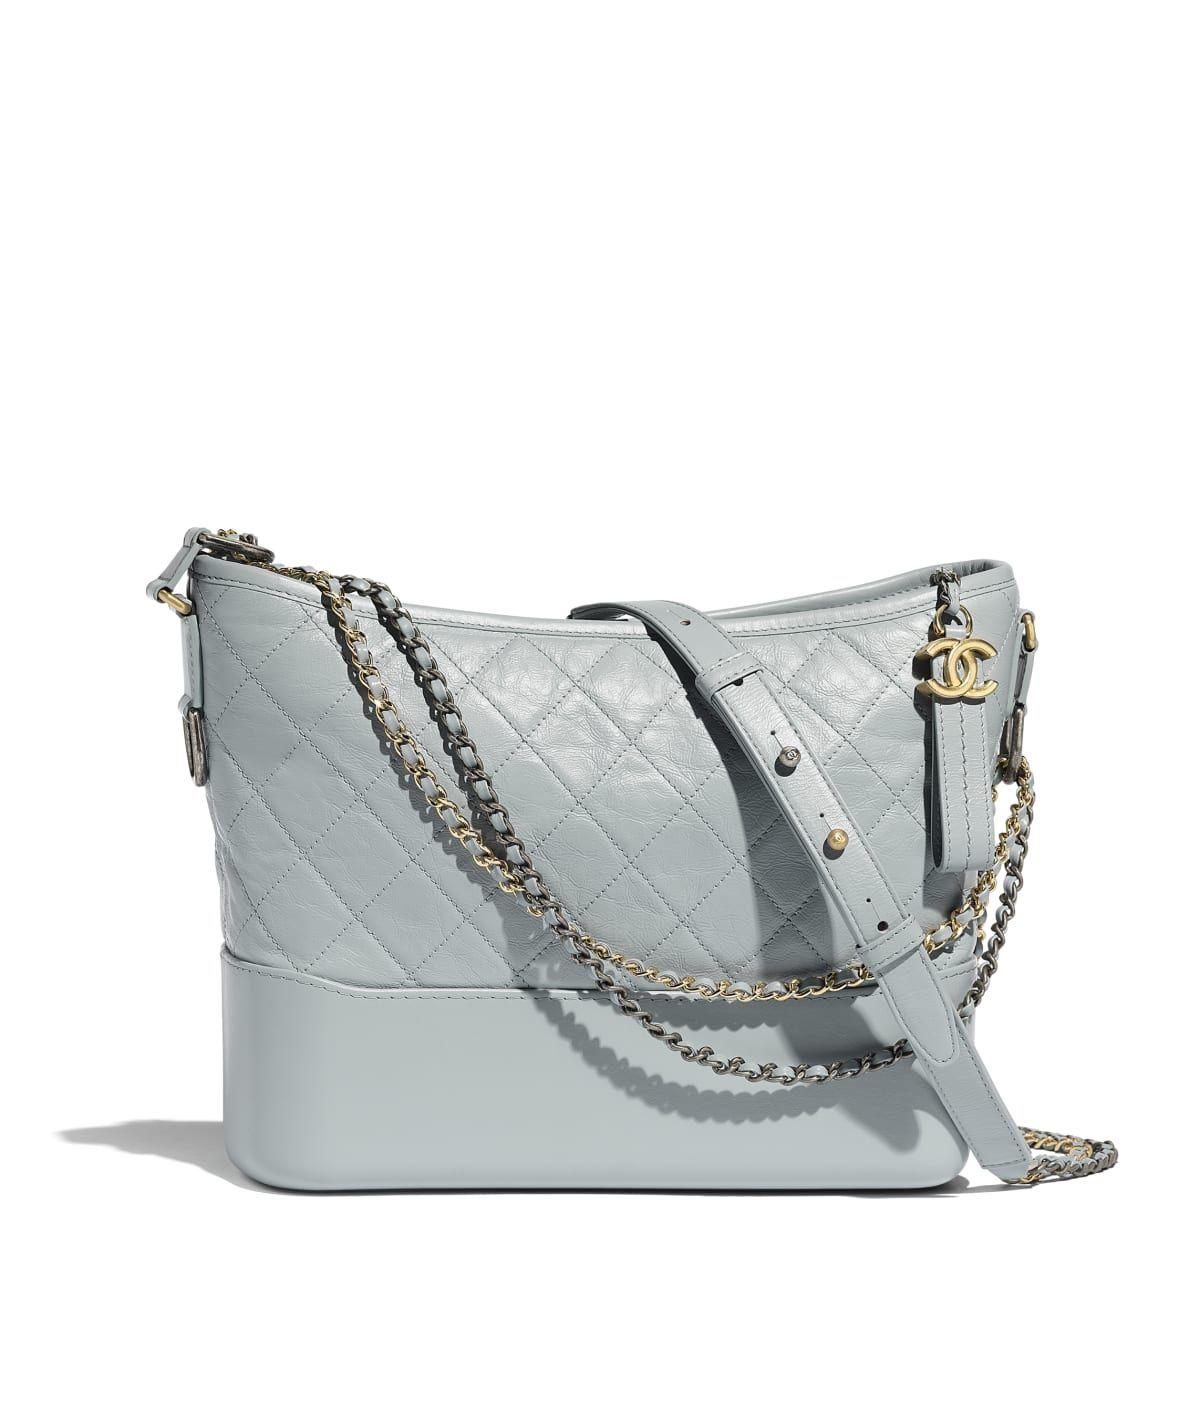 0777a1adbda5 Handbags of the Spring-Summer 2019 Pre-Collection CHANEL Fashion collection  : CHANEL'S GABRIELLE Hobo Bag, aged calfskin, smooth calfskin, silver-tone  ...